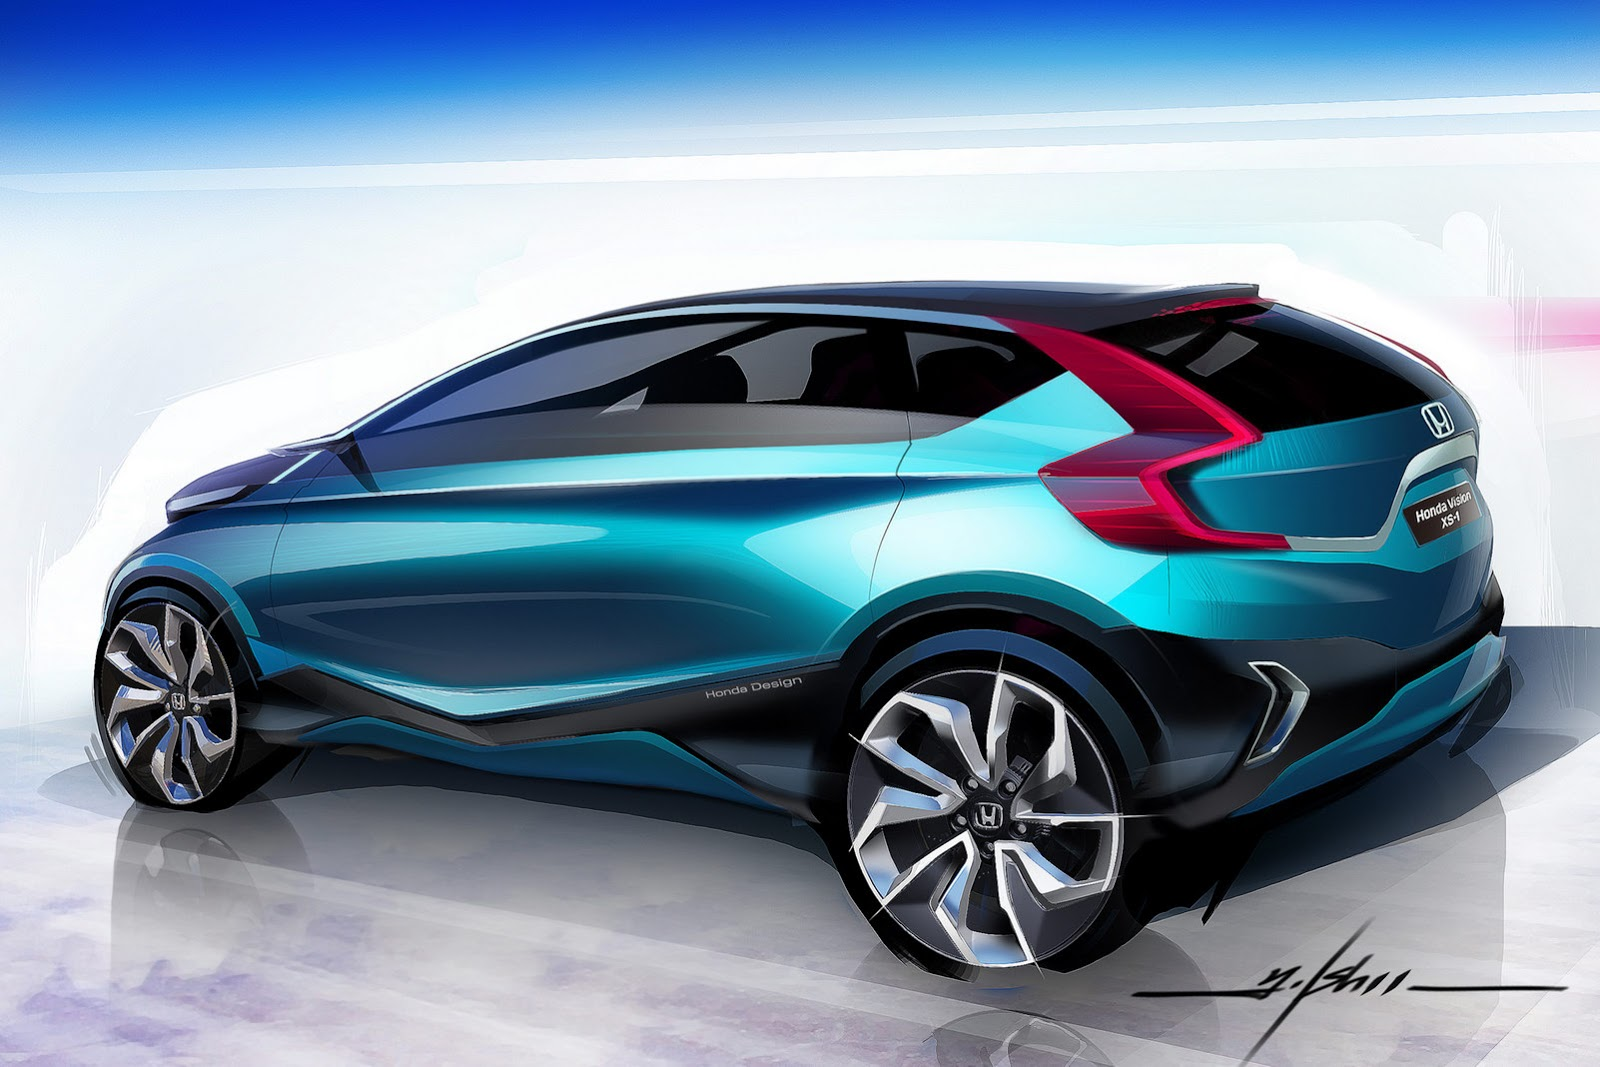 Honda Xs 1 Concept Unveiled At 2014 New Delhi Auto Expo Live Photos Autoevolution